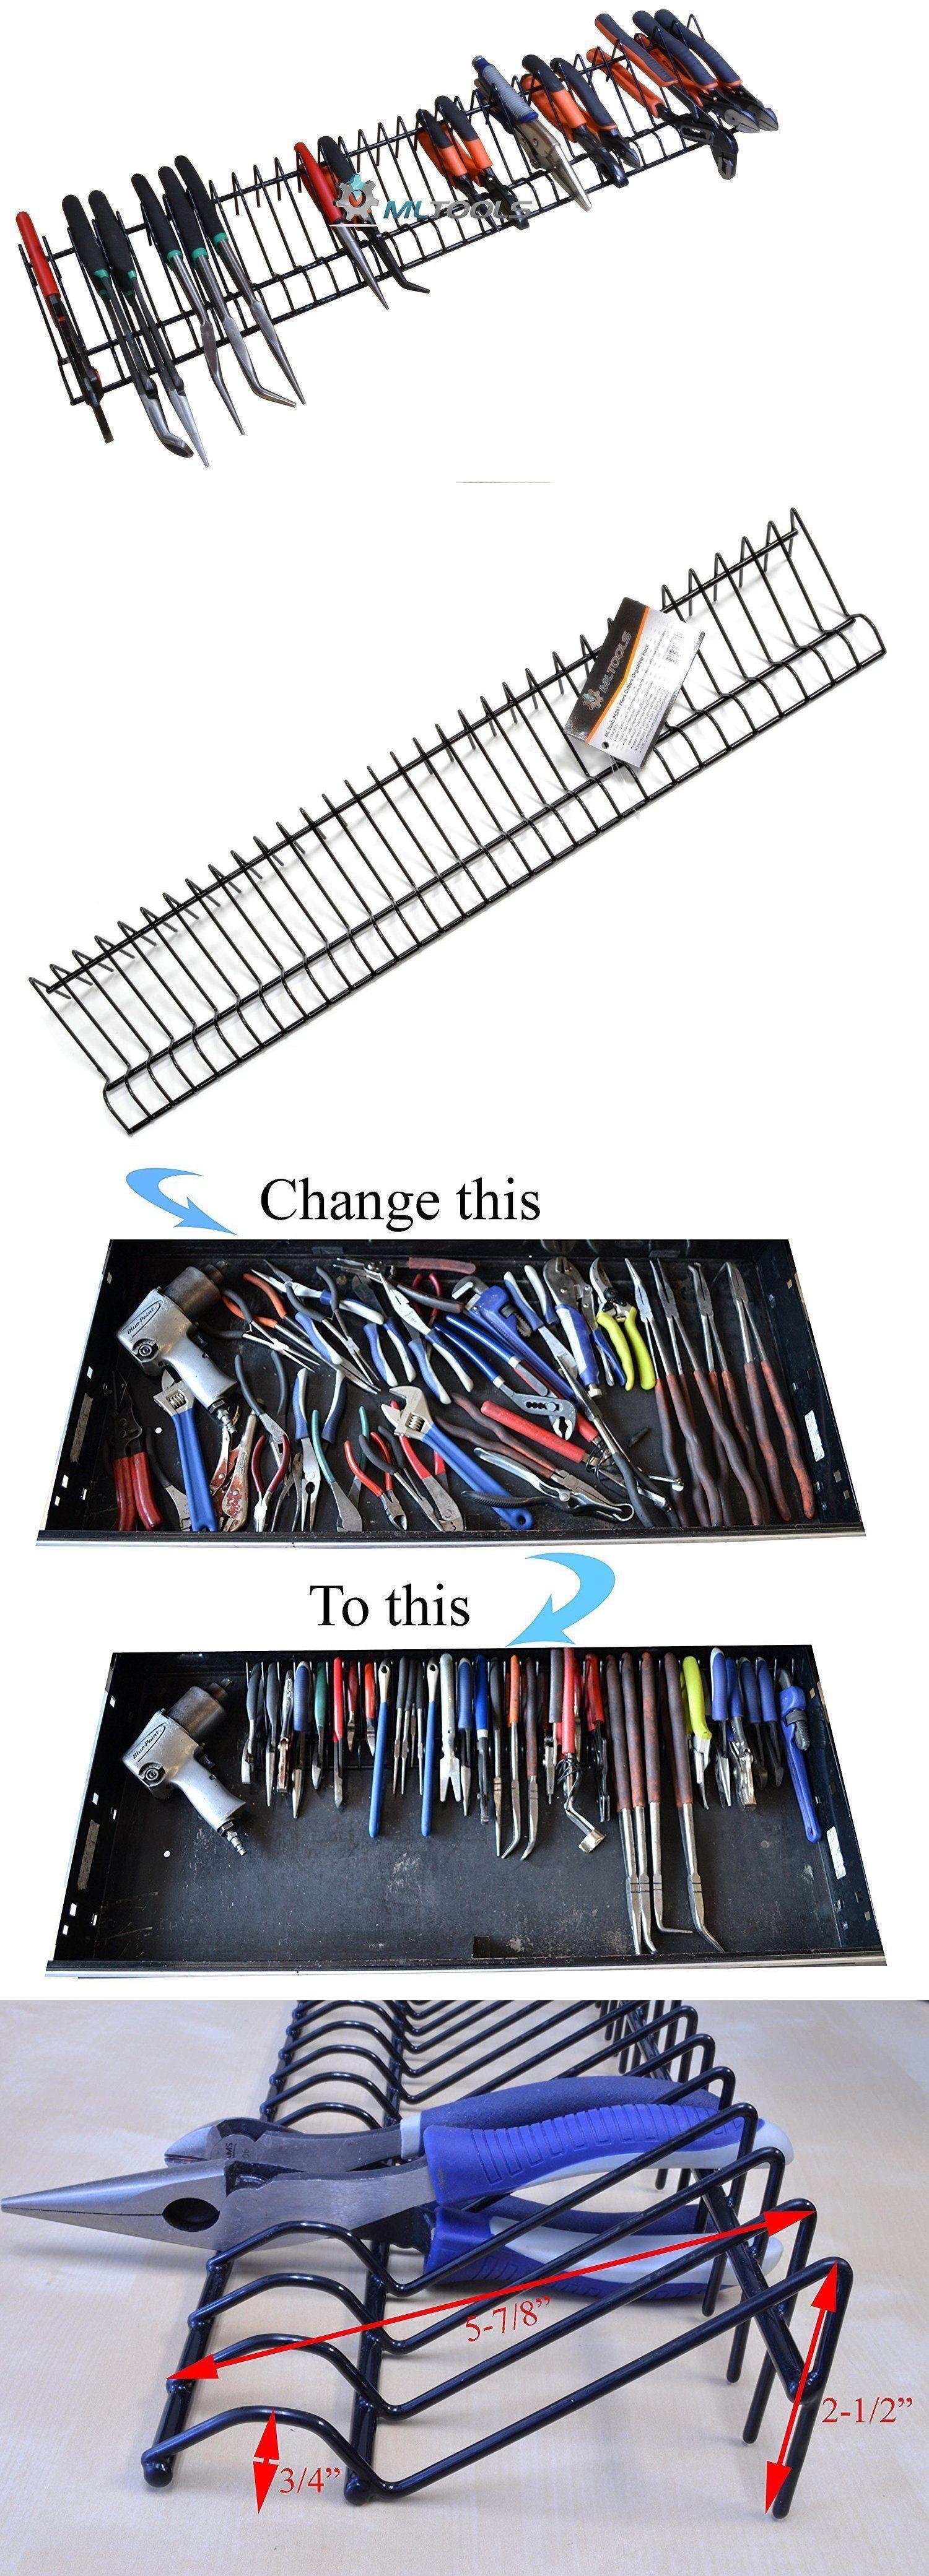 32 Tools Pliers Cutters Organizer Garage Tool Storage Rack Holder Drawer Box